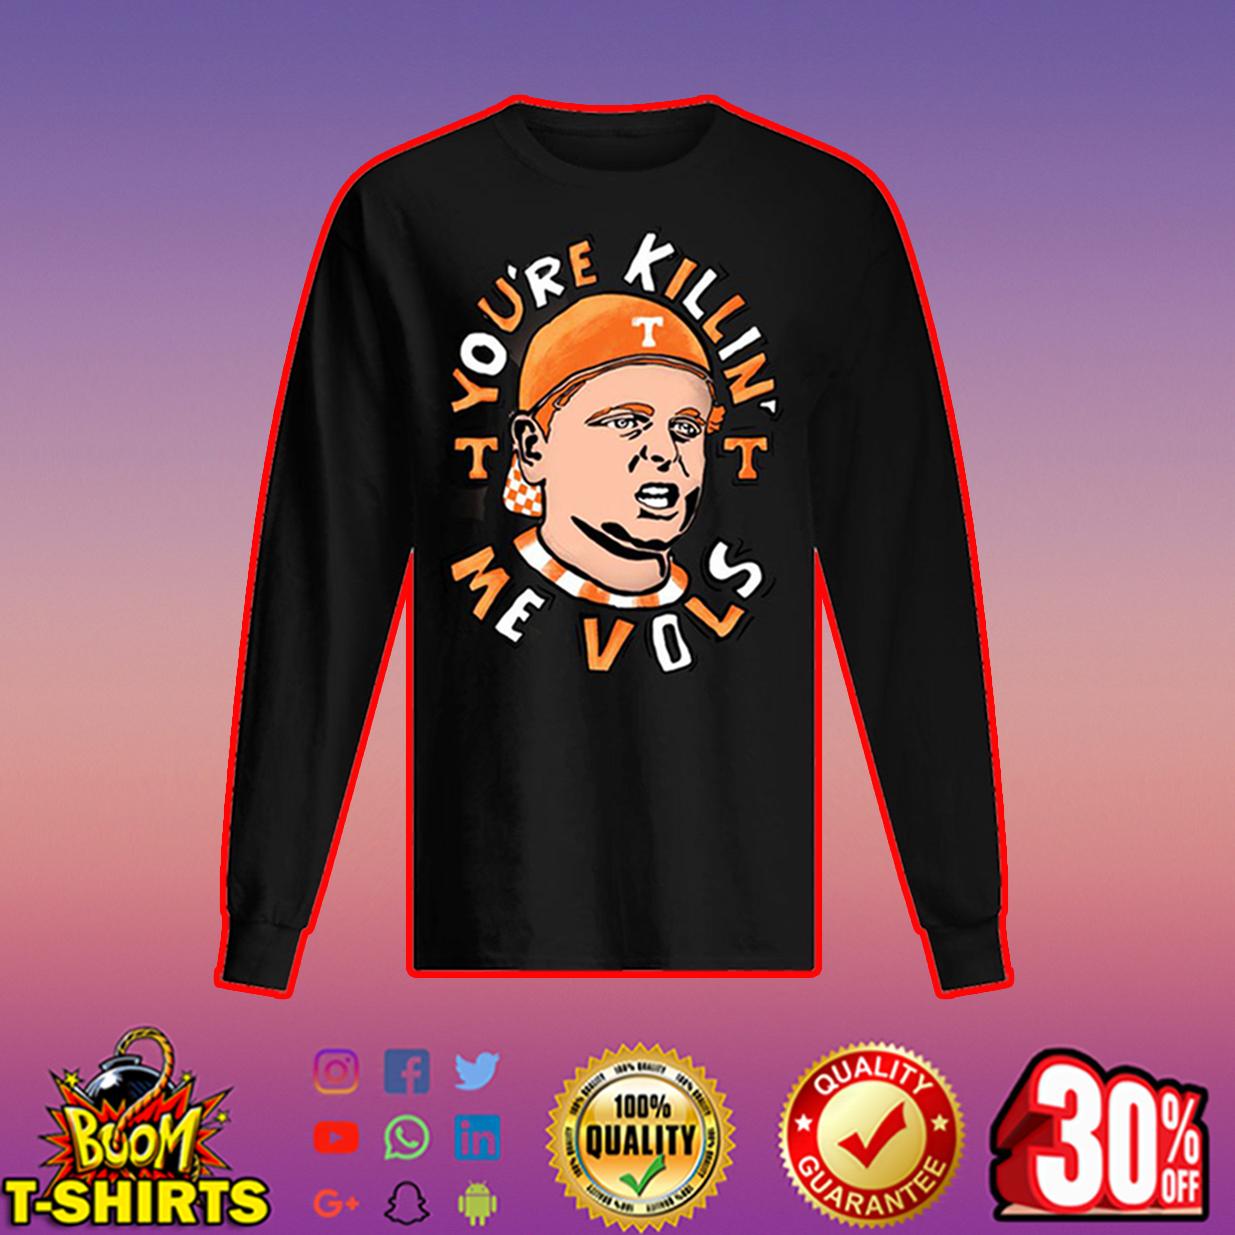 You're Killin' Me Vols long sleeved t-shirt